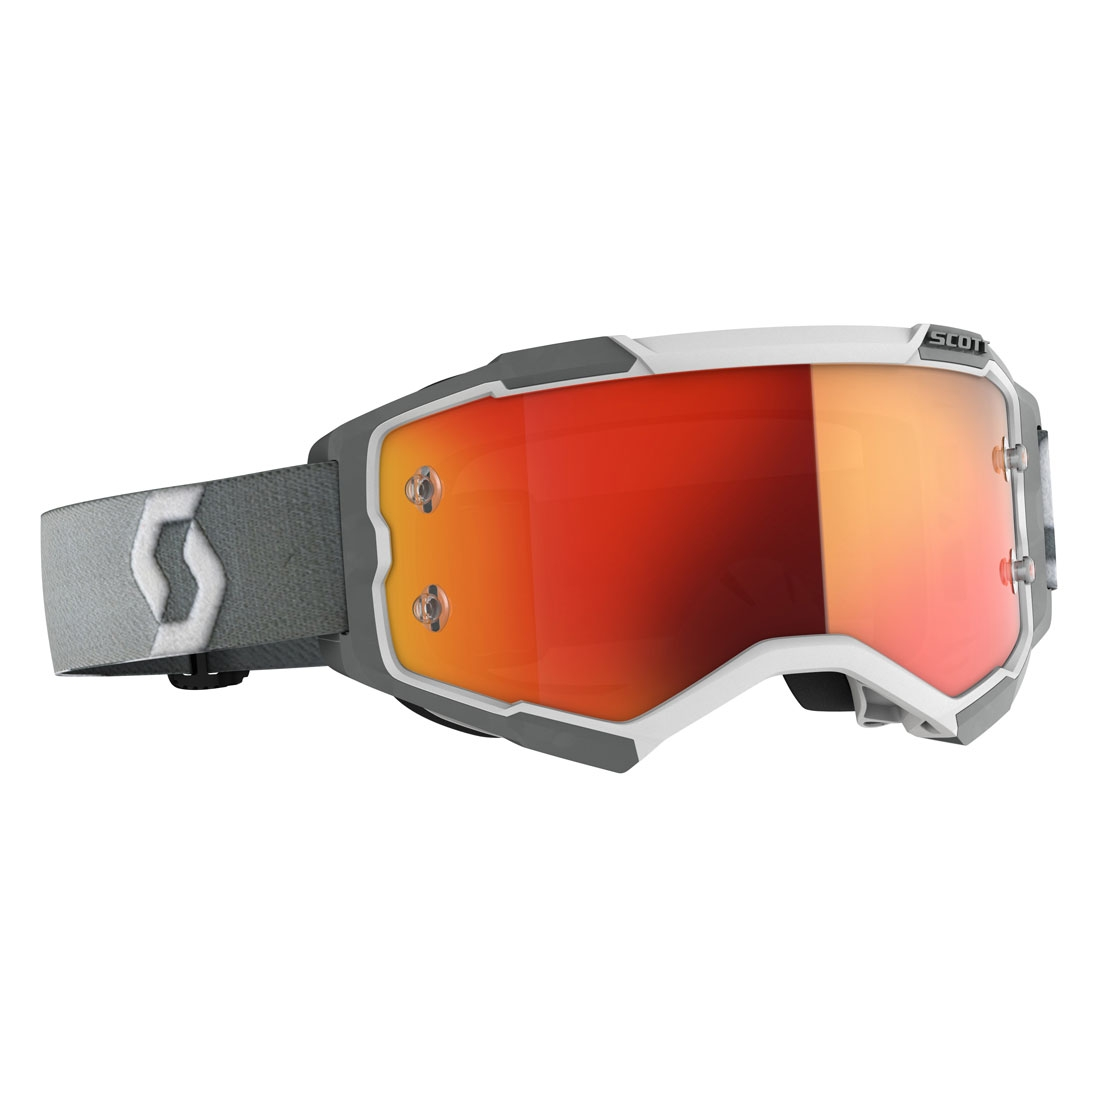 Occhiali (maschera) cross 2020 Scott FURY white grey lente orange chrome 1